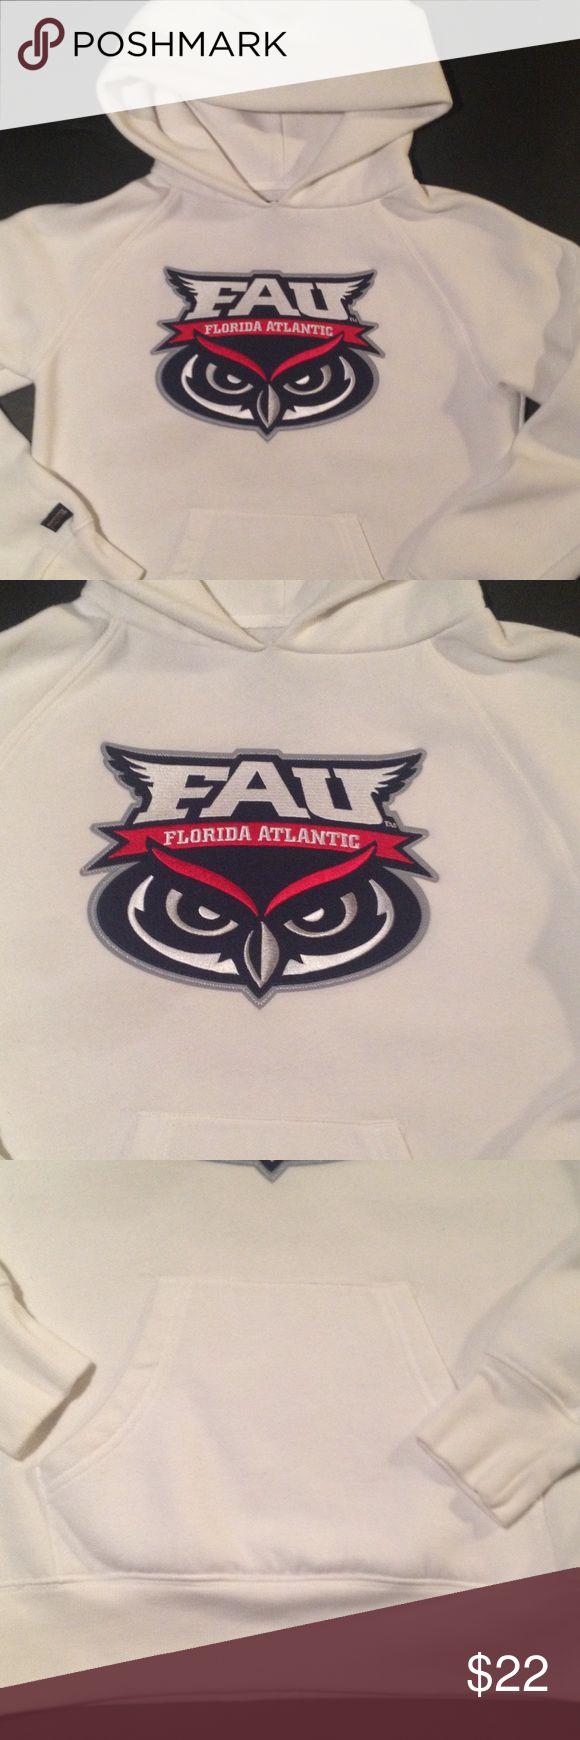 Florida Atlantic University Hoodie Cozy FAU hoodie. Kangaroo pockets. Size small. Chest 36. Made by Jansport. Jansport Tops Sweatshirts & Hoodies